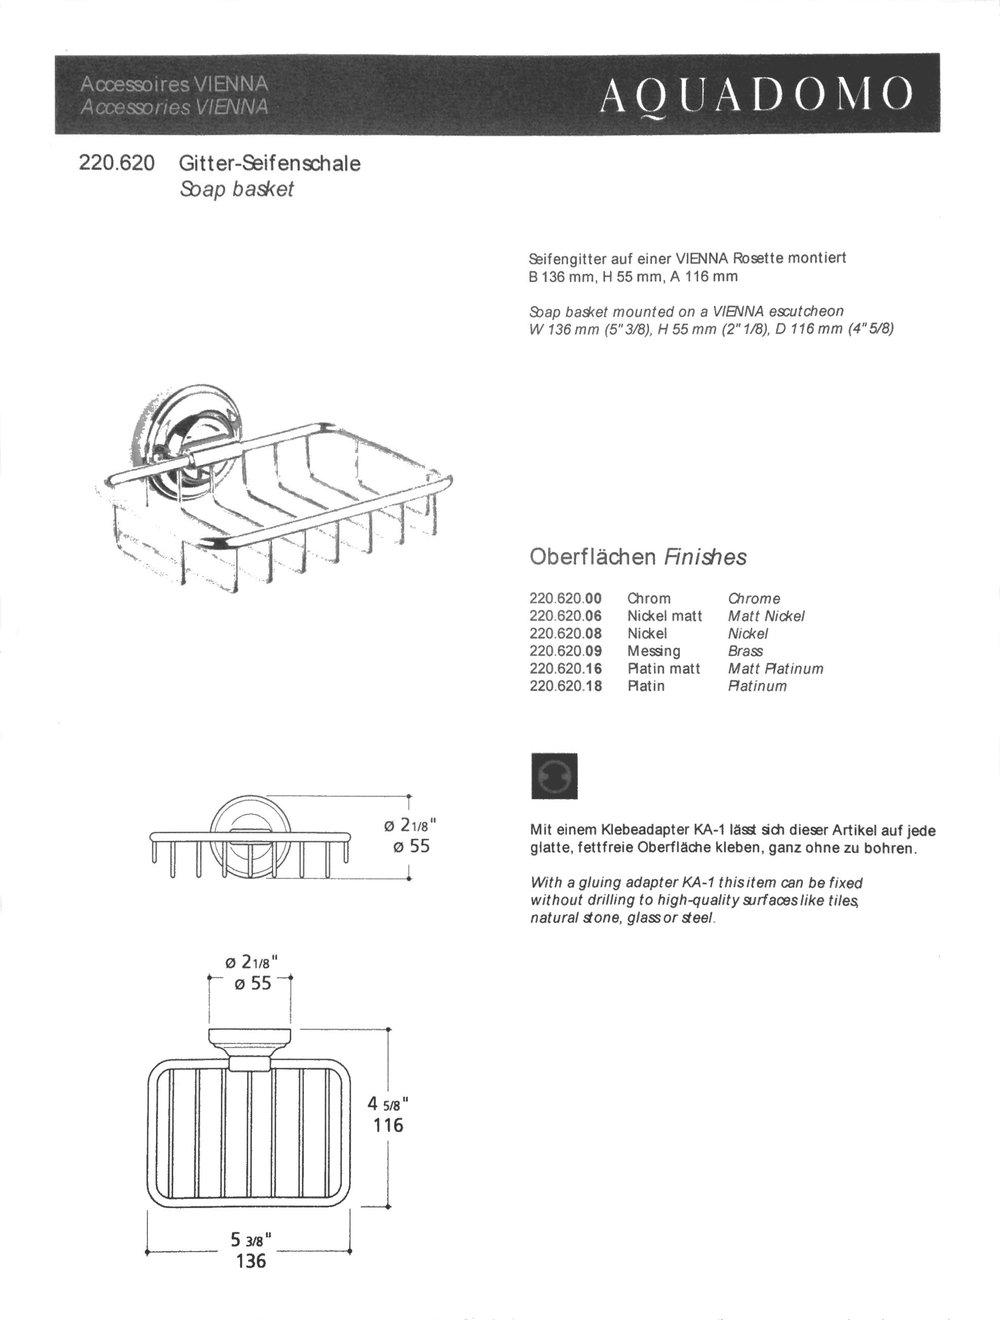 Aquadomo VIENNA Soap basket, 13,6 w x 11,6 proj. x 5,5 tall, PC, PN.jpg